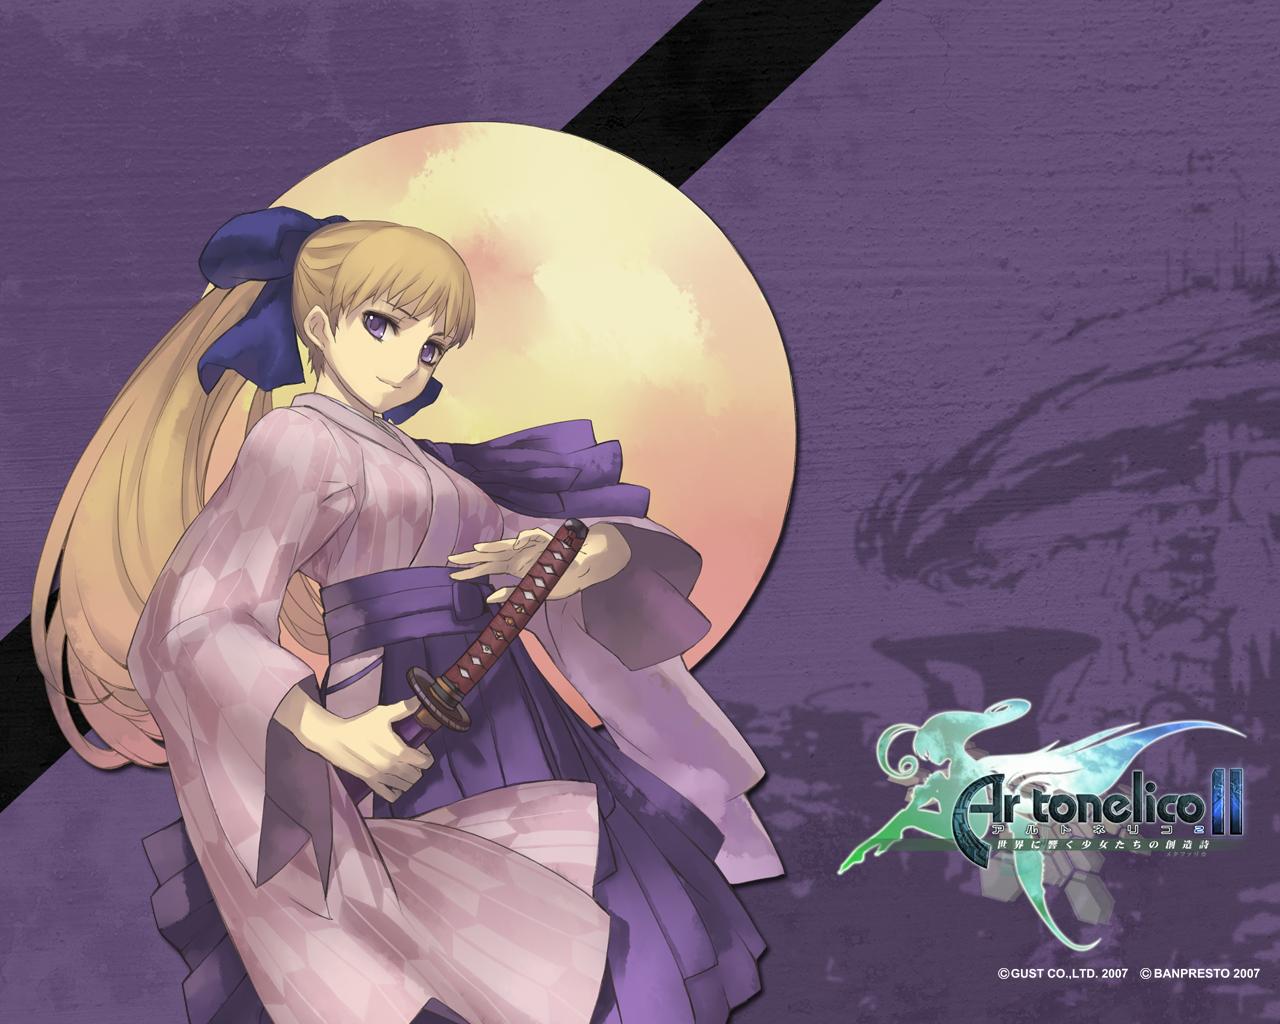 ar_tonelico ar_tonelico_ii cloche_leythal_pastalia japanese_clothes katana nagi_ryou sword weapon